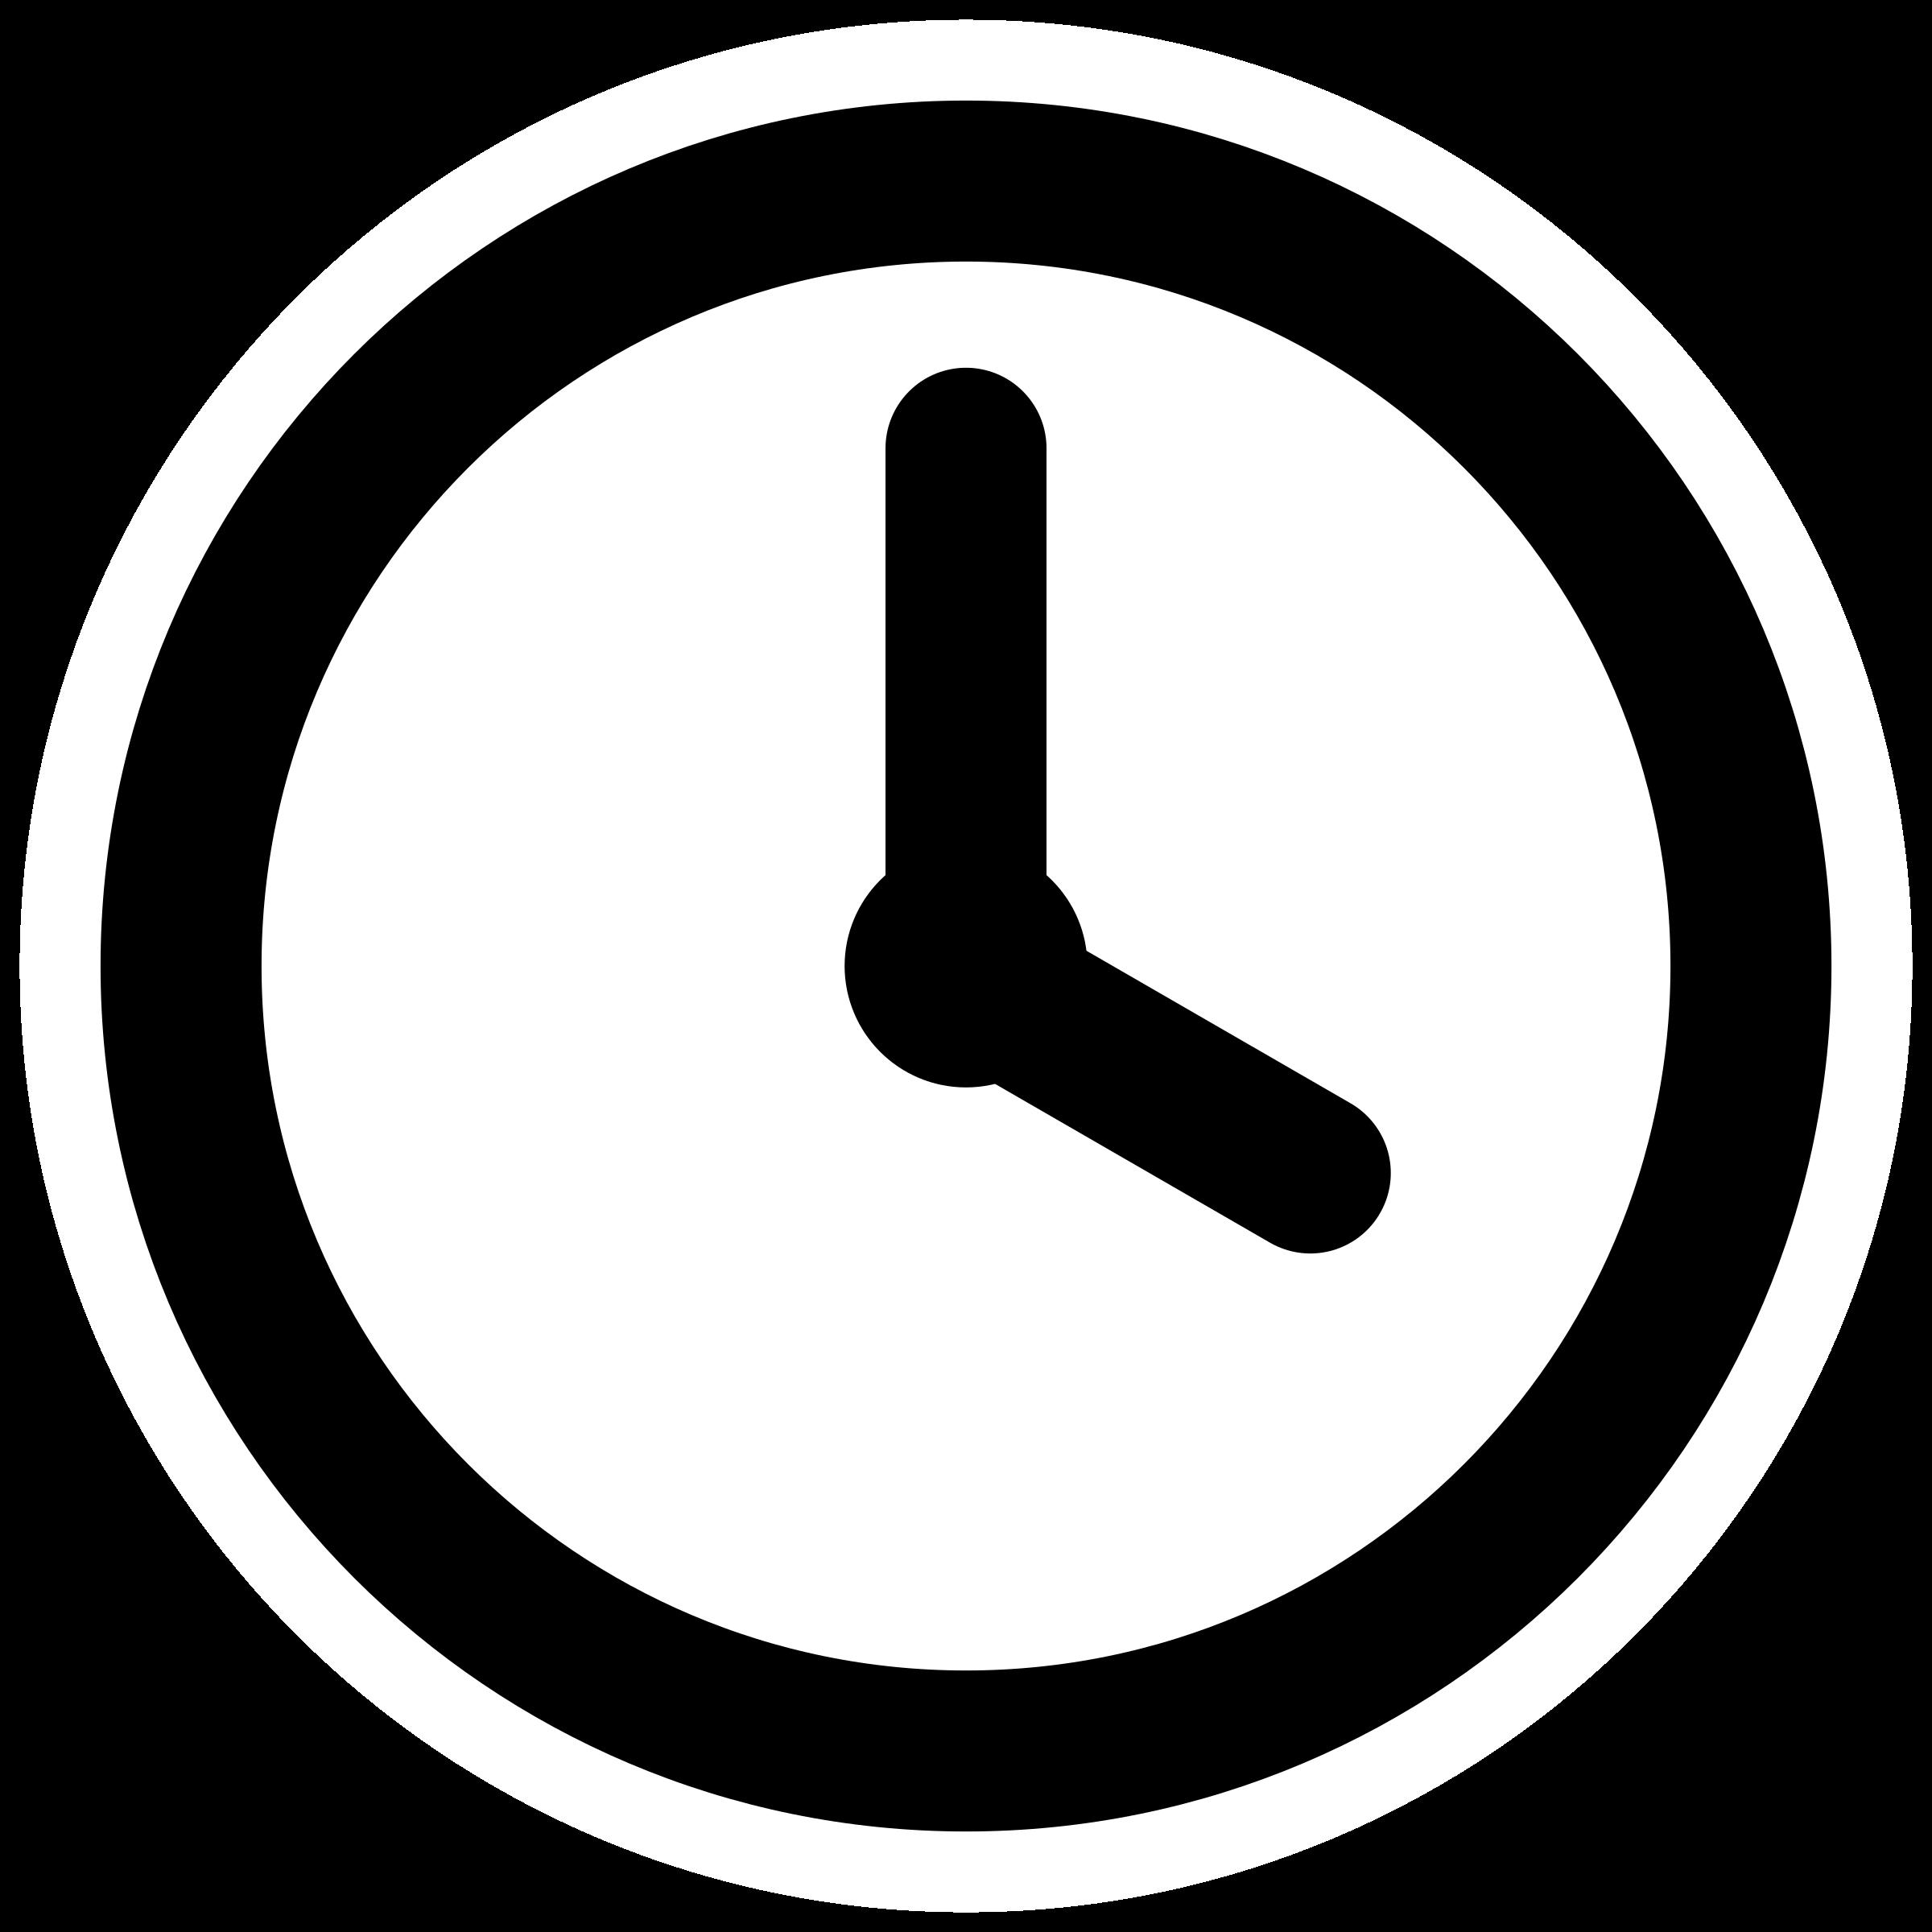 Clipart Mono Tool Timer-Clipart mono tool timer-3